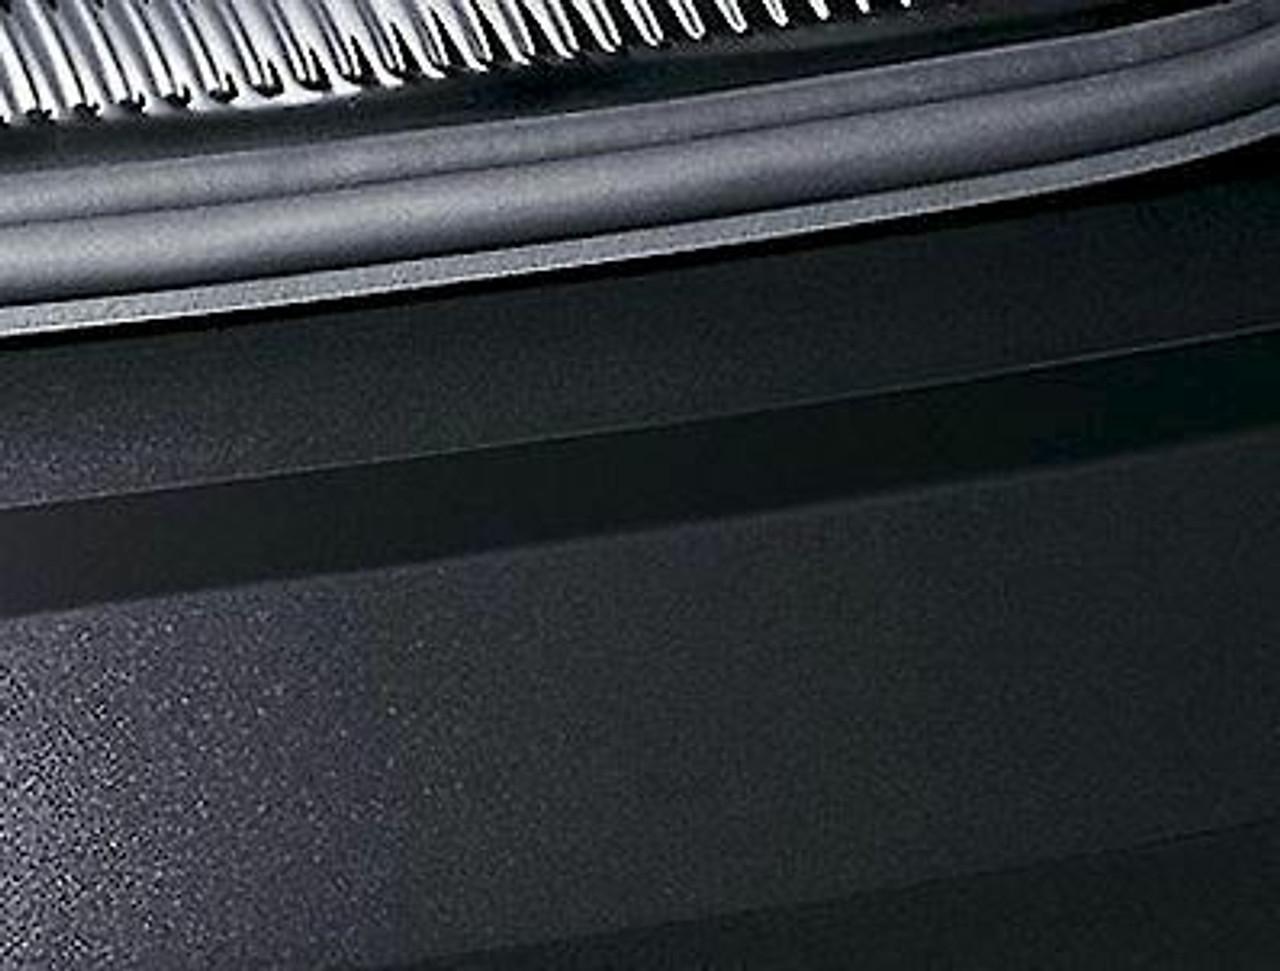 Audi A6 Avant 2012-2018 Clear Load Edge Protective Film 4G9061197